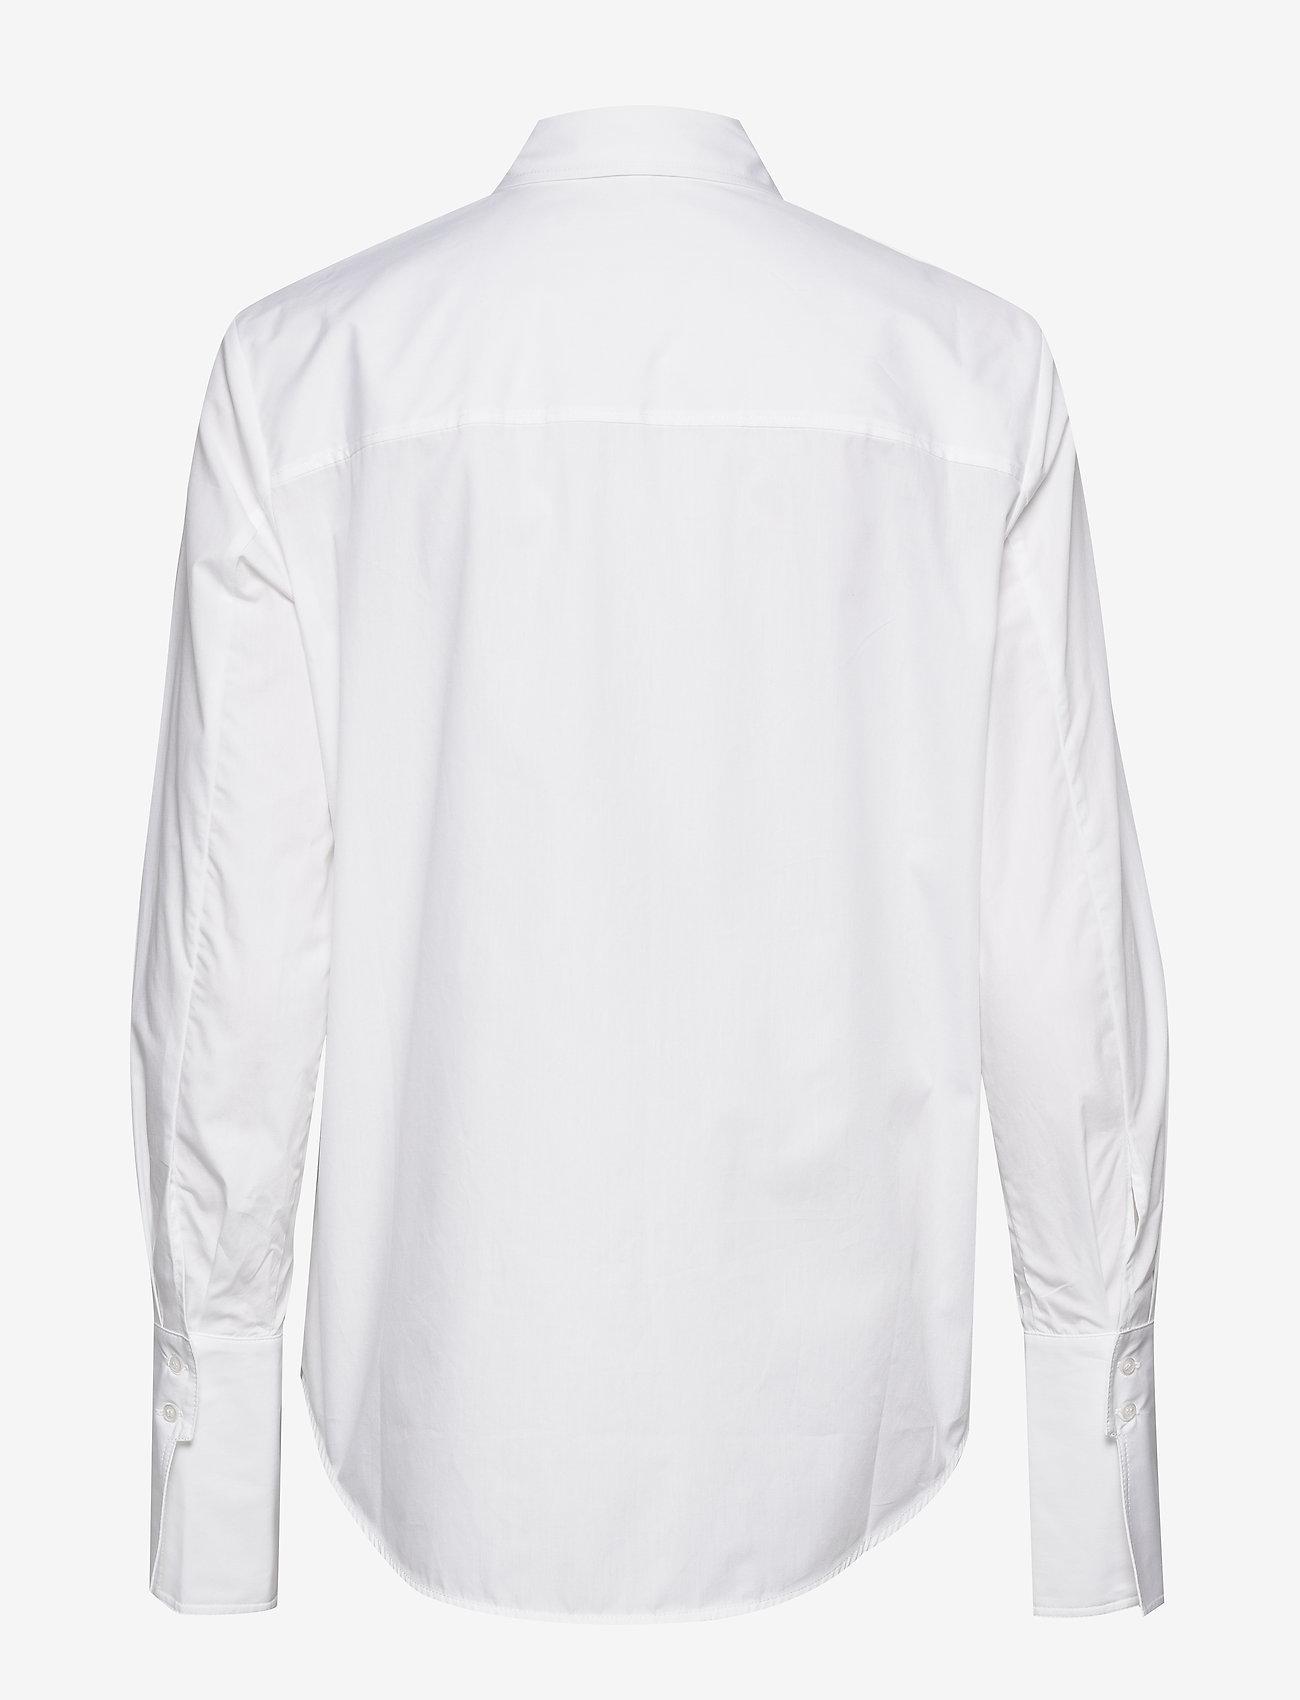 Linda (White) (179 €) - Dagmar mKDAj